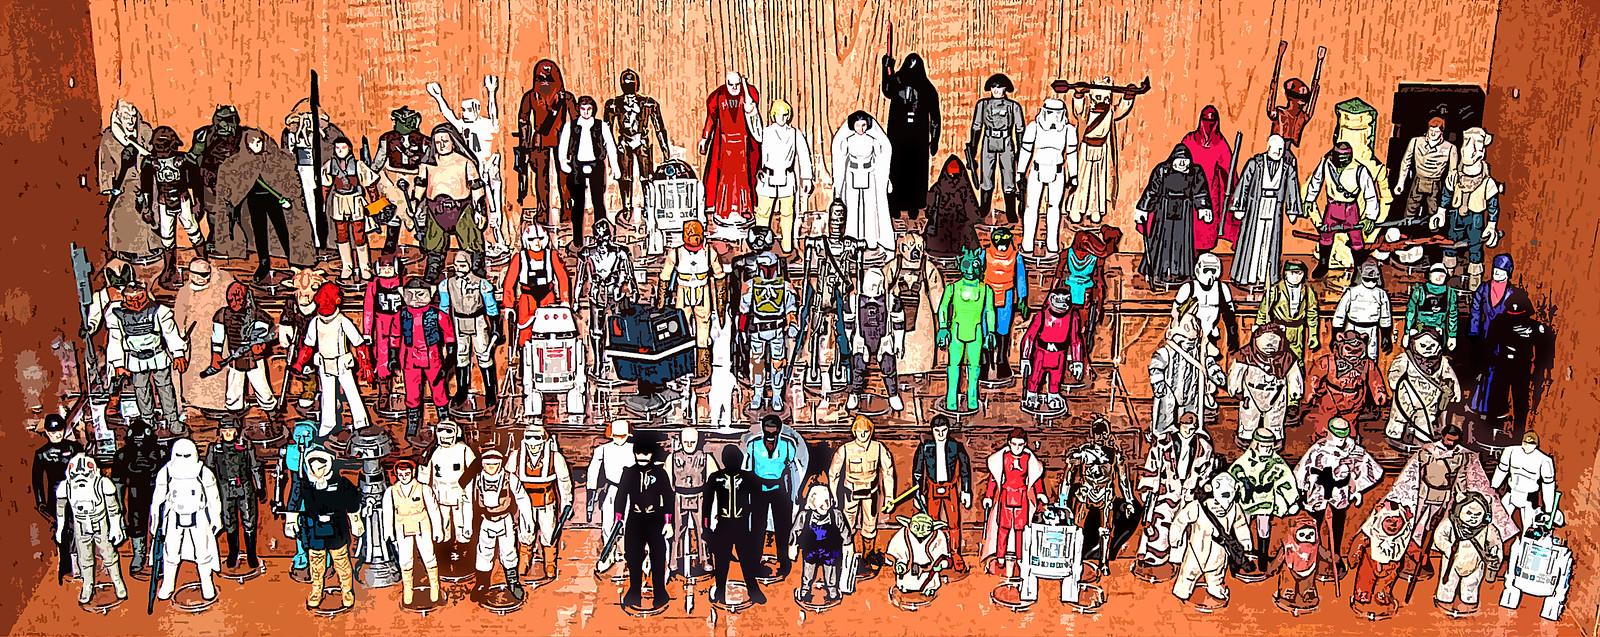 psybertech's Star Wars Figures Artwork Limelight - Page 3 14436256260_b1730a44a9_h